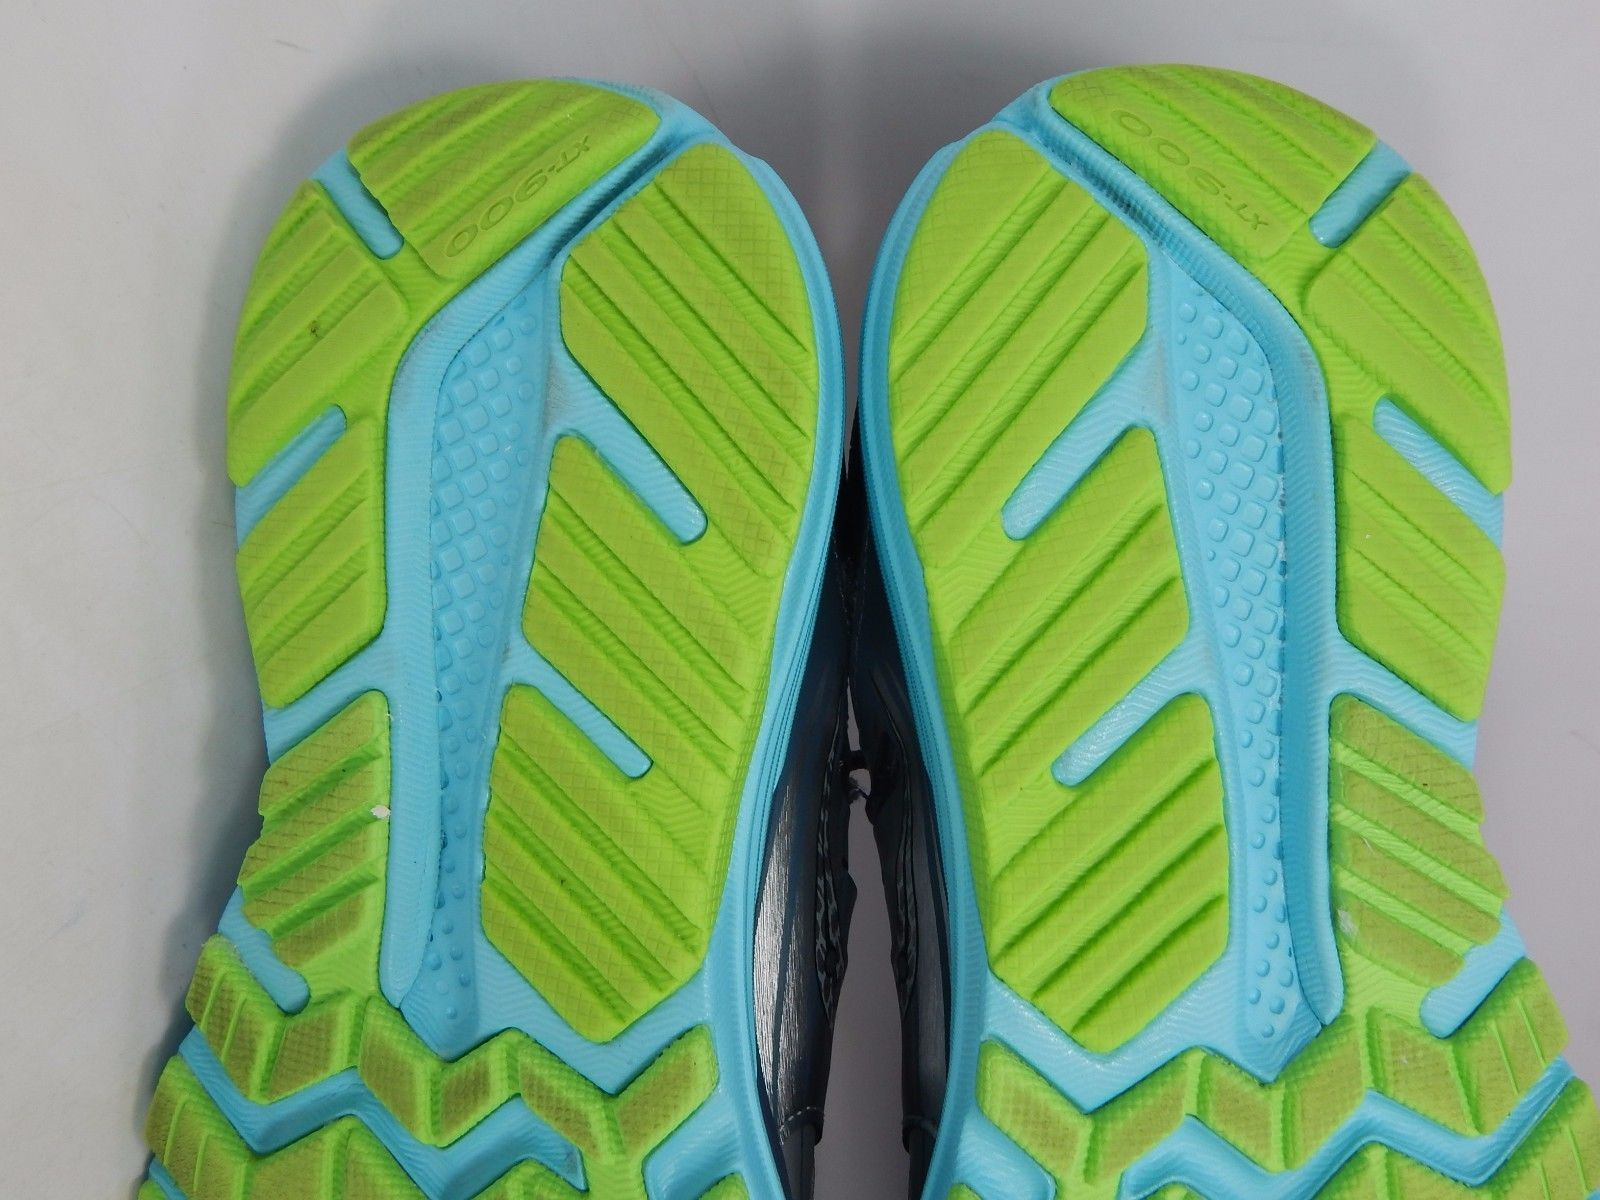 Saucony Triumph ISO 2 Women's Running Shoes Sz US 9 M (B) EU 40.5 Gray S10290-1